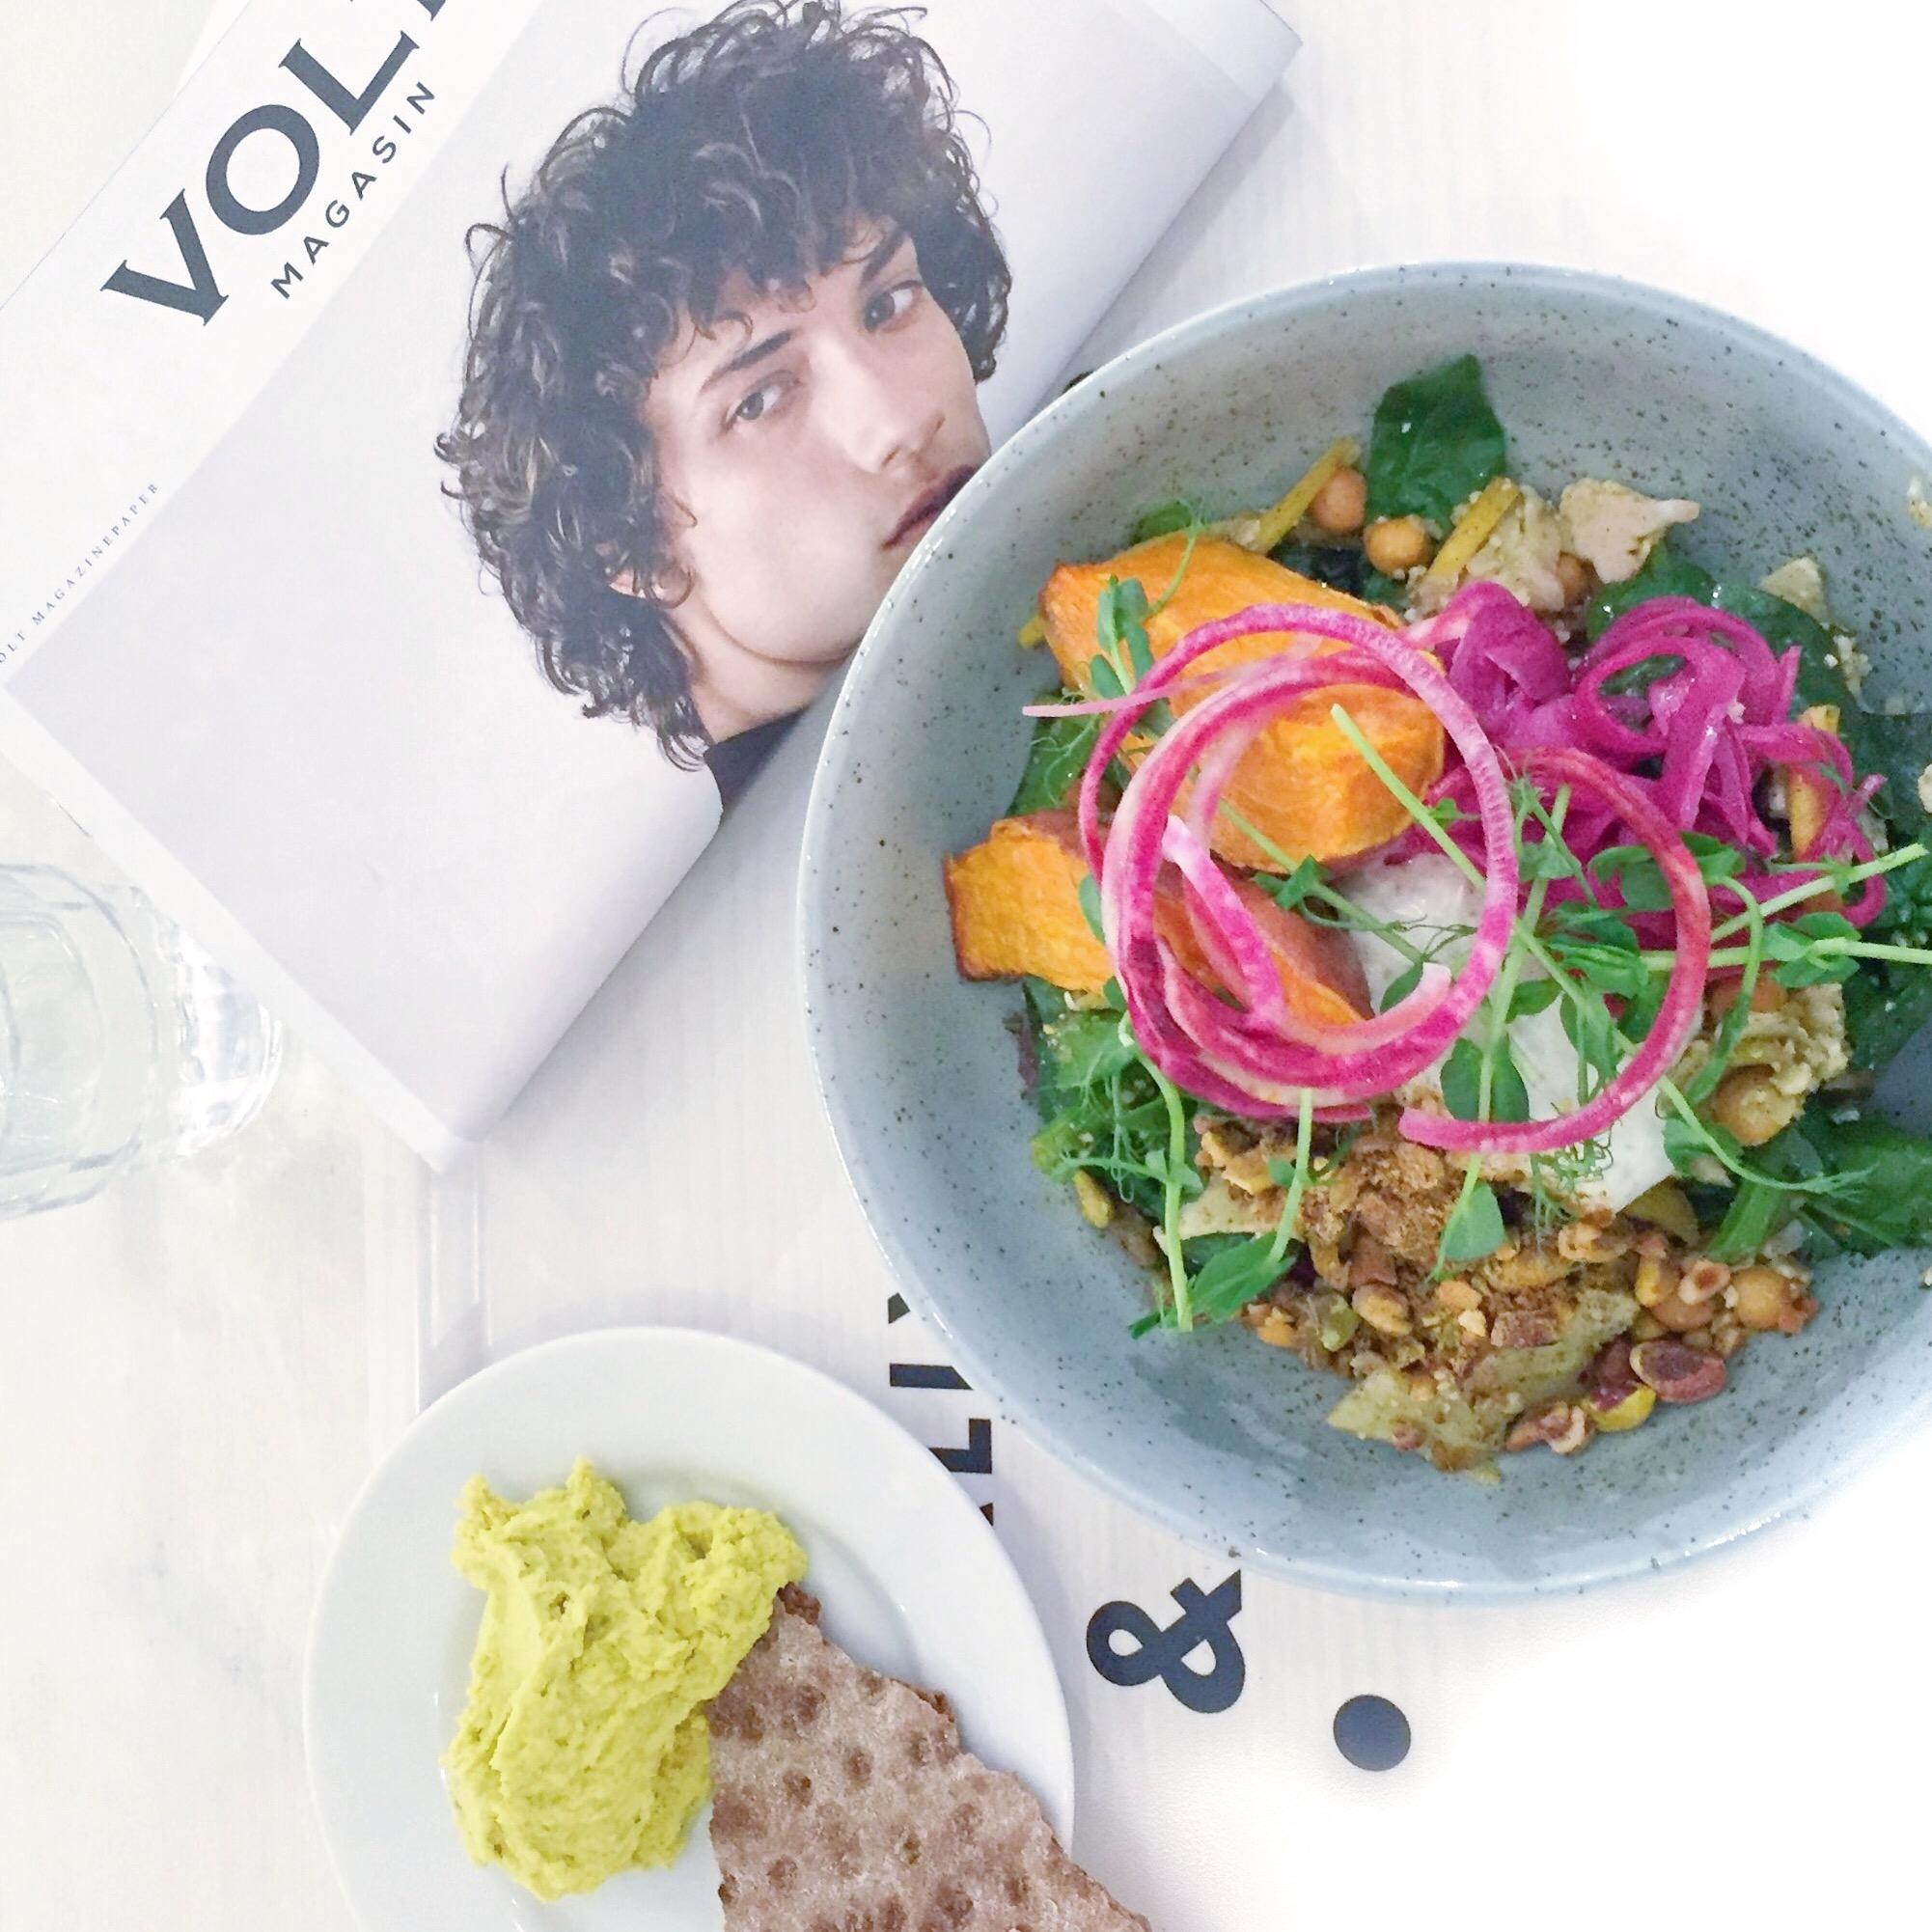 Salat med sweet potato, rødløg, nødder og kikærter. Hummus. Volt magasin